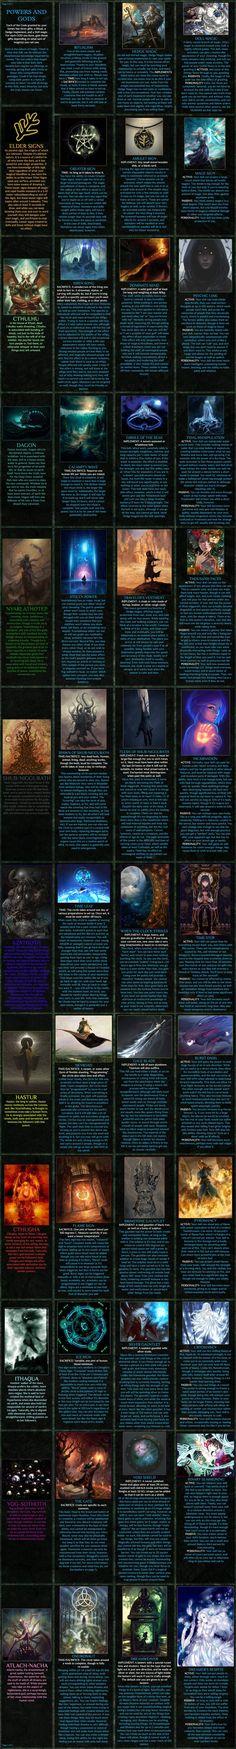 Post with 359 votes and 29336 views. Tagged with lovecraft, urban fantasy, cyoa; Shared by Zysek. An Eldrich Bloodline CYOA Cyoa Games, Rpg Board Games, Admin Jobs, Yog Sothoth, Magic Magic Magic, Writing Fantasy, Fictional World, Fantasy Inspiration, Anime Fantasy